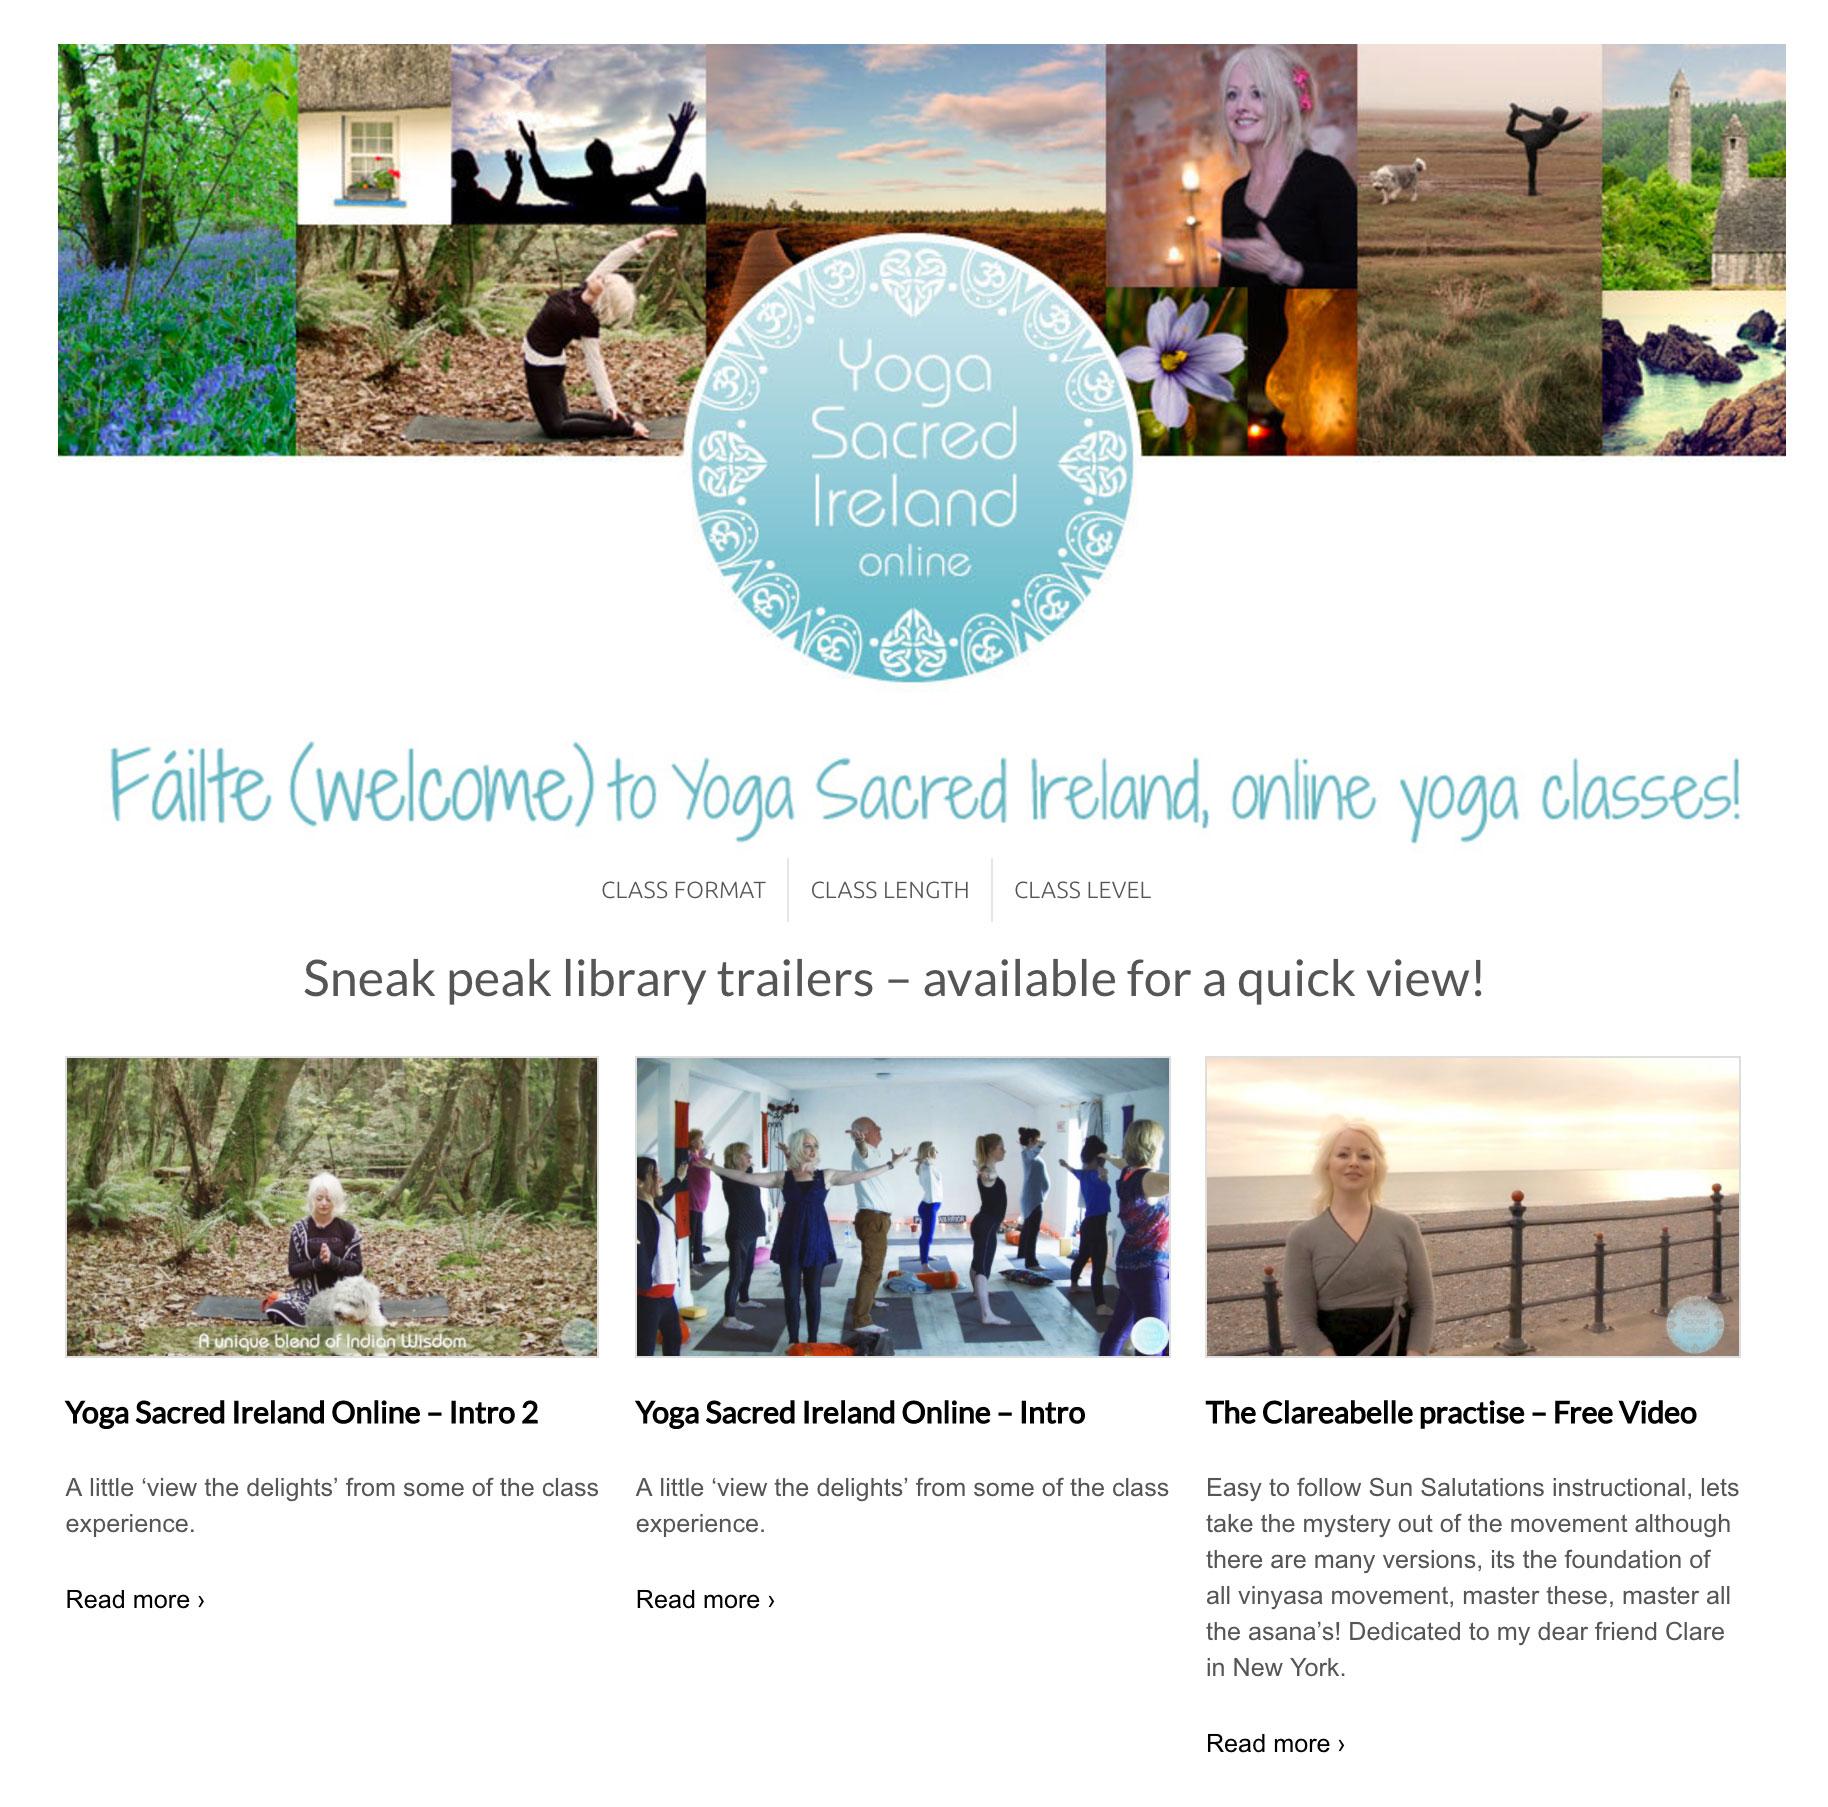 Yoga sacred Ireland Online Website